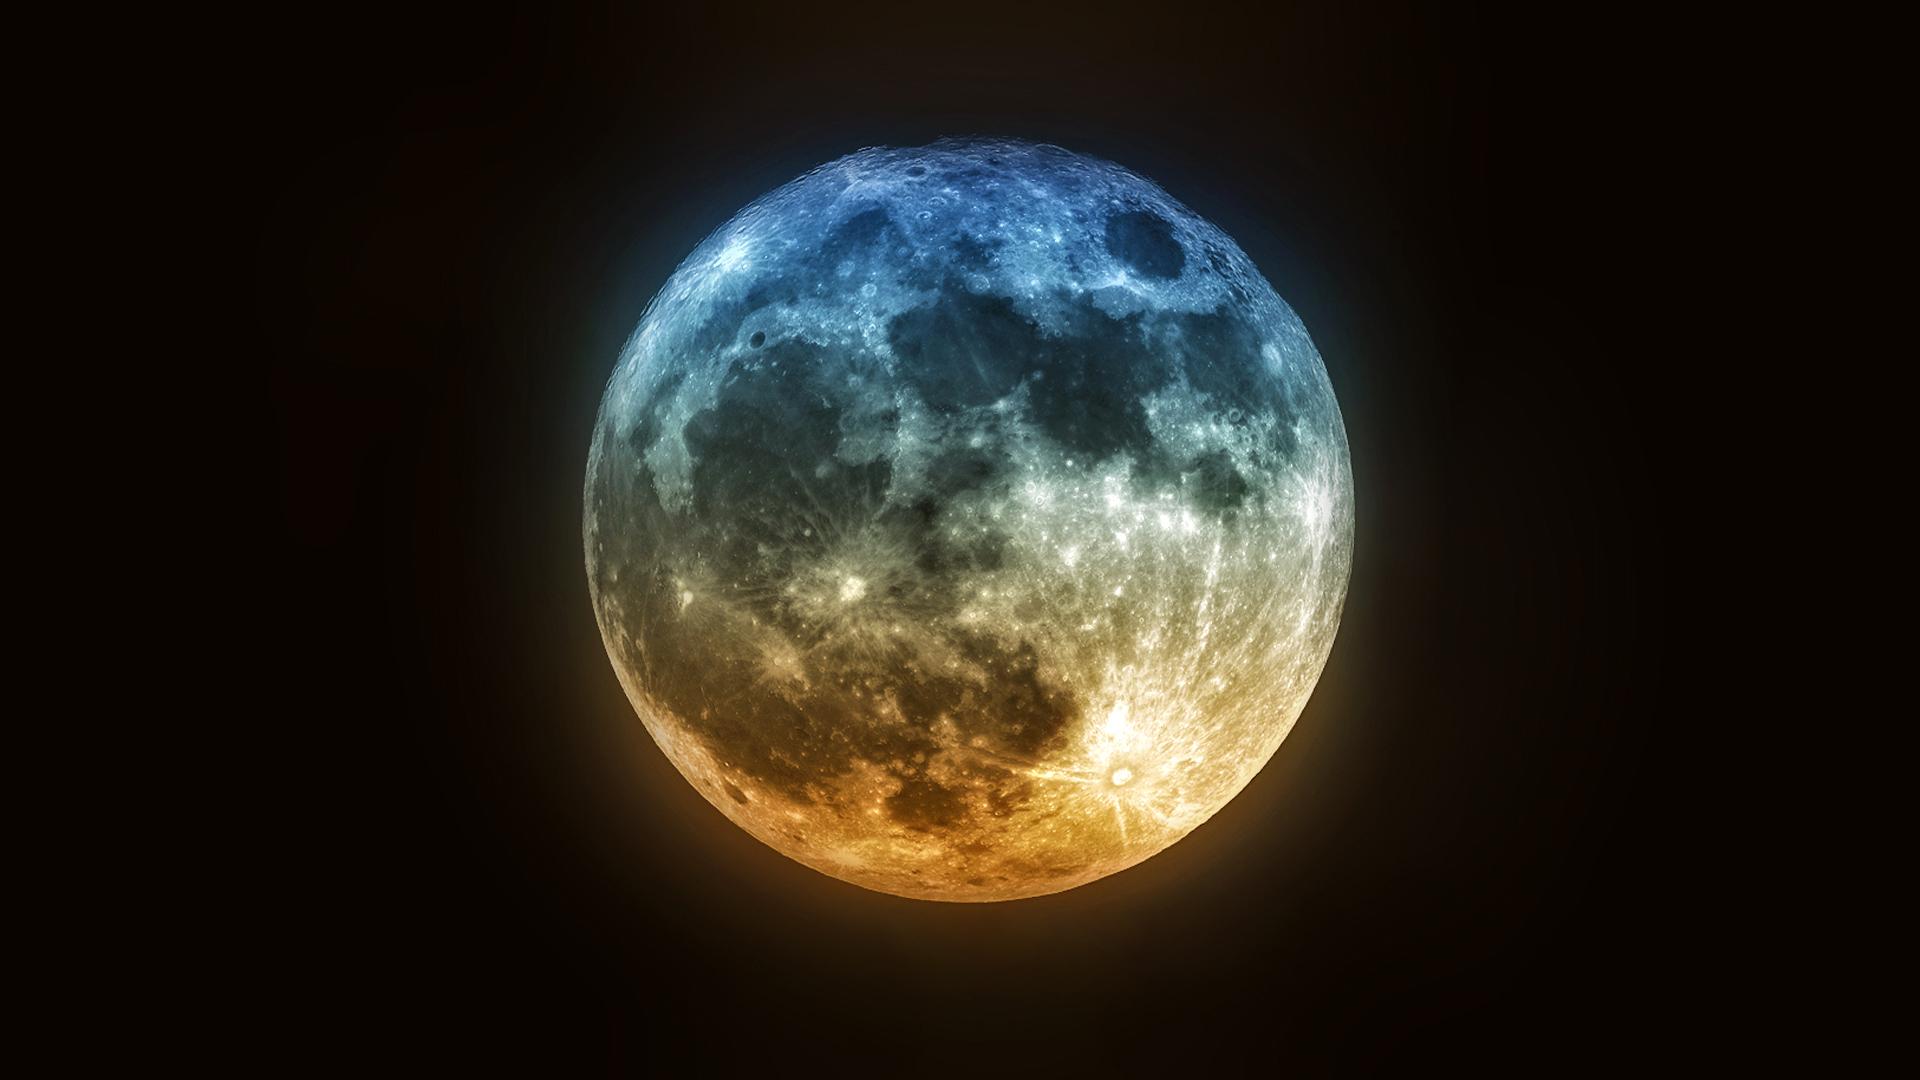 Beautiful Night Moon Photos HD Wallpaper Free